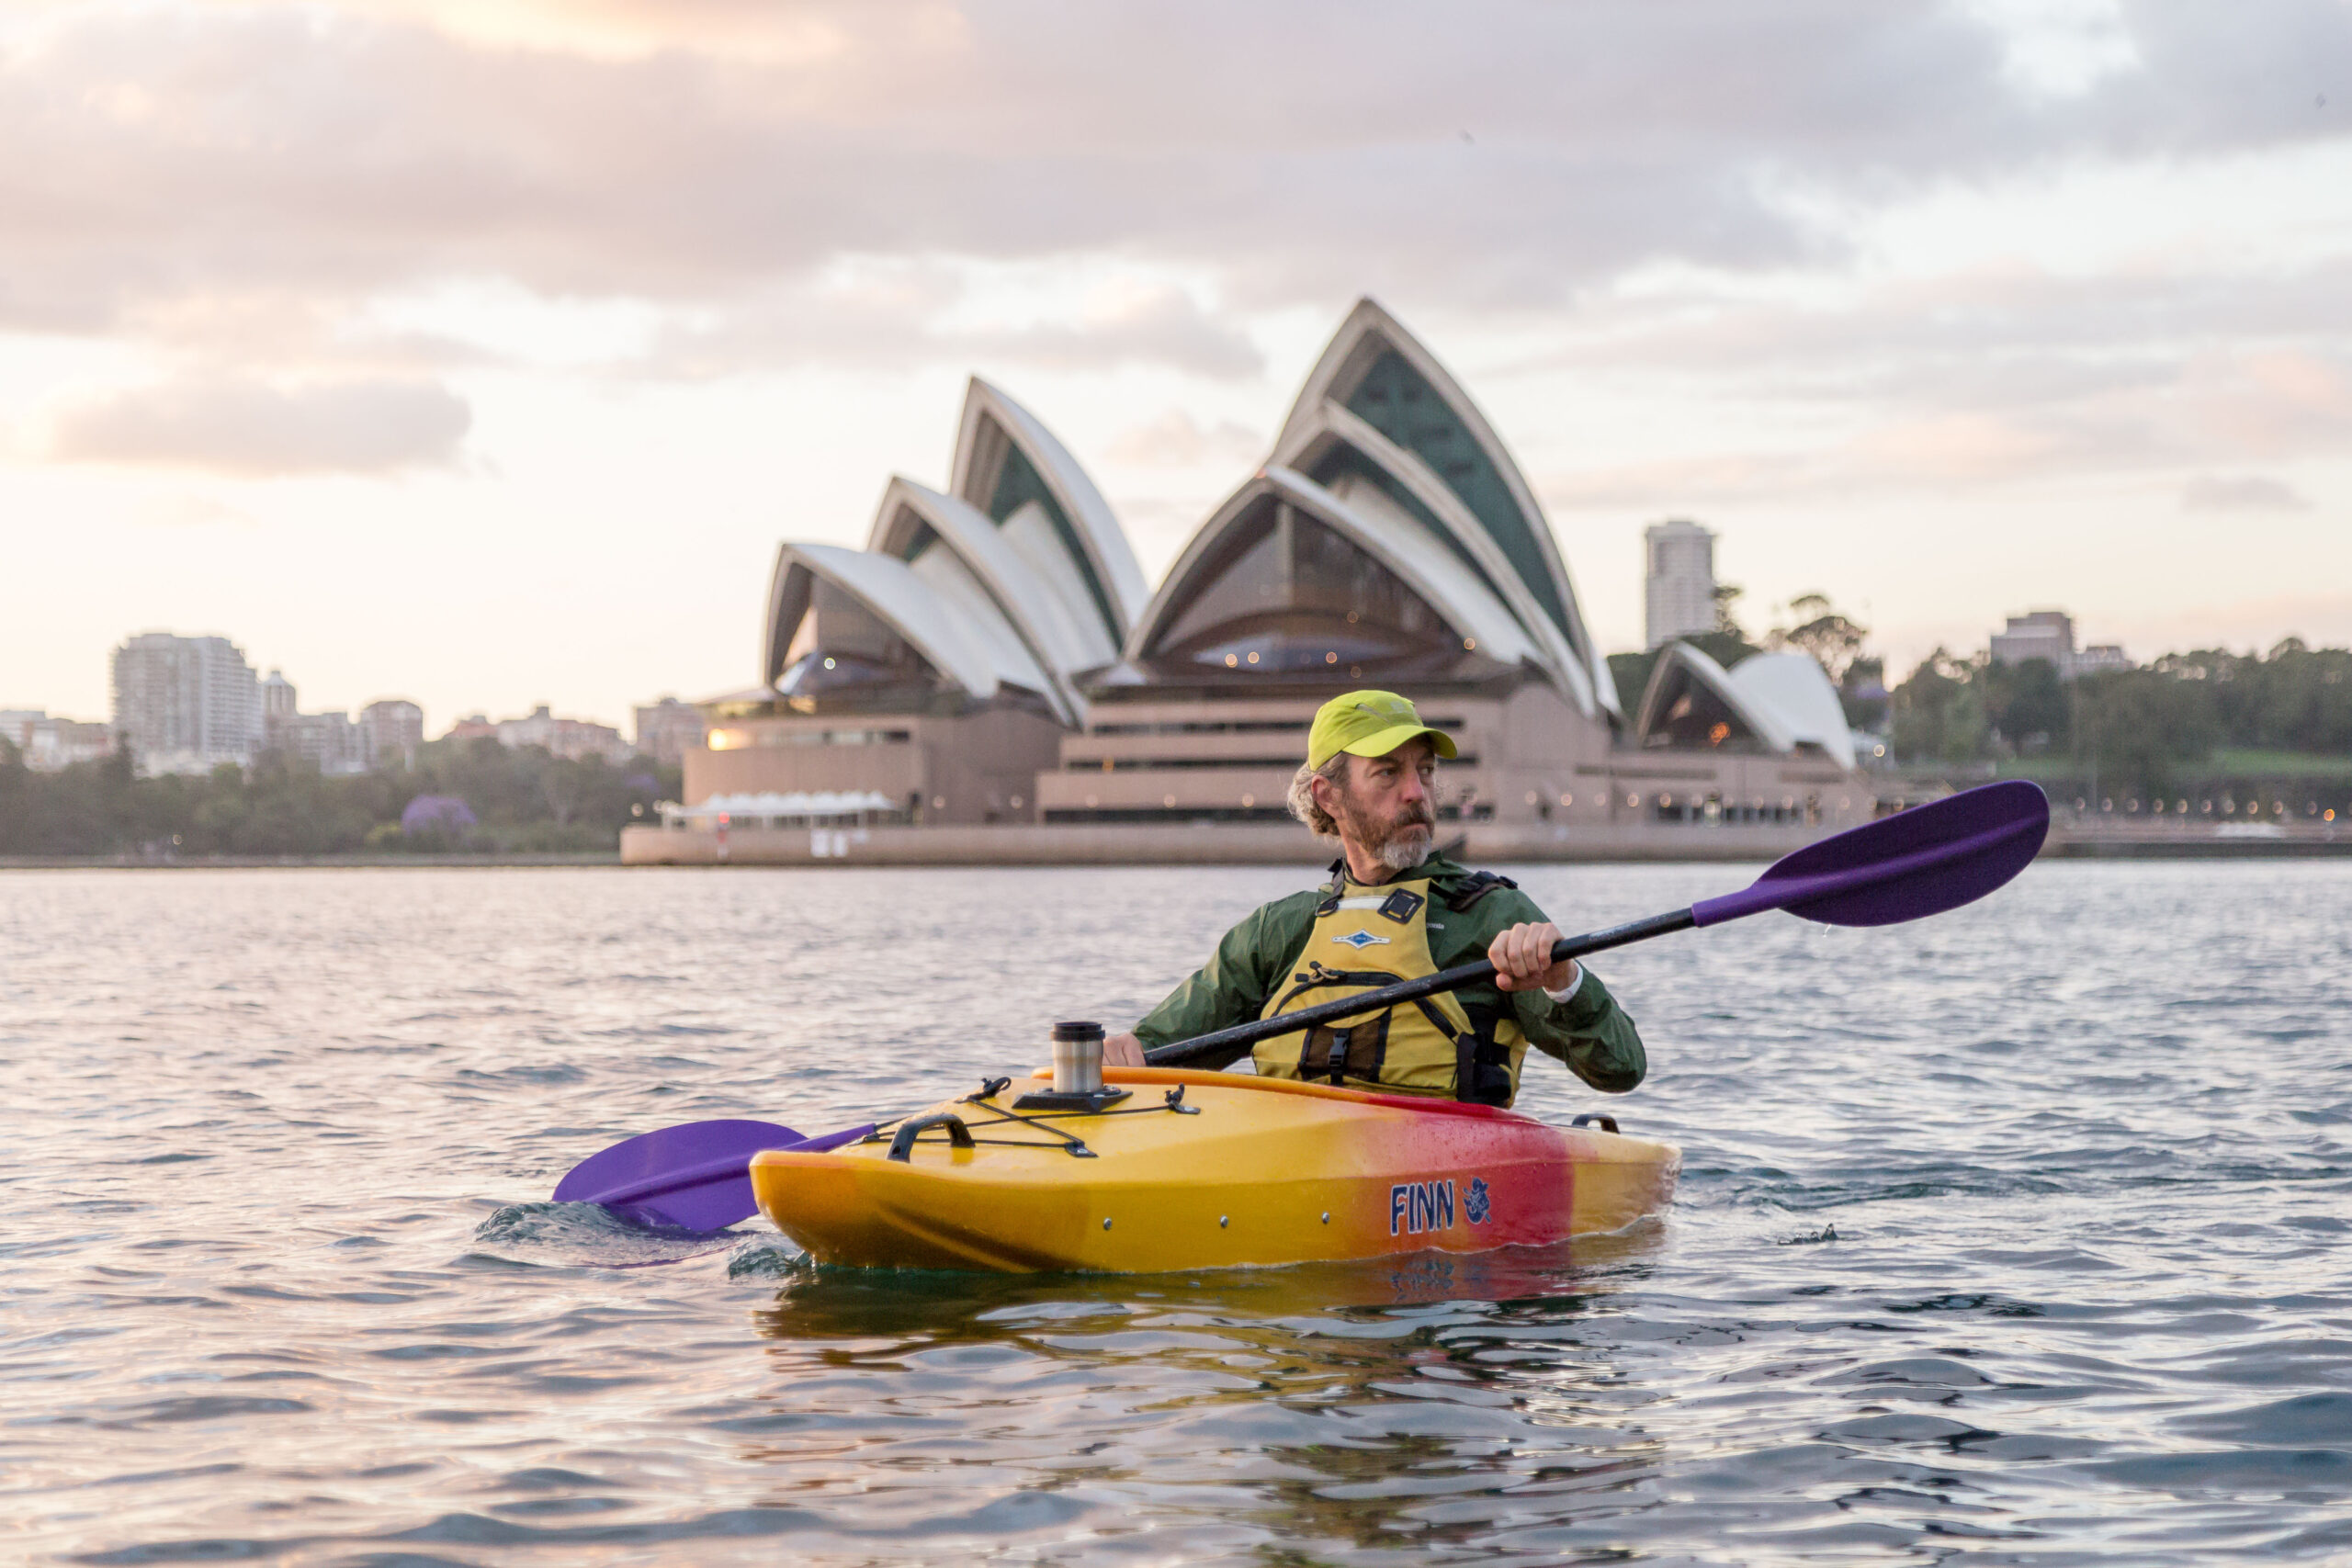 Jeff kayaking in Sydney